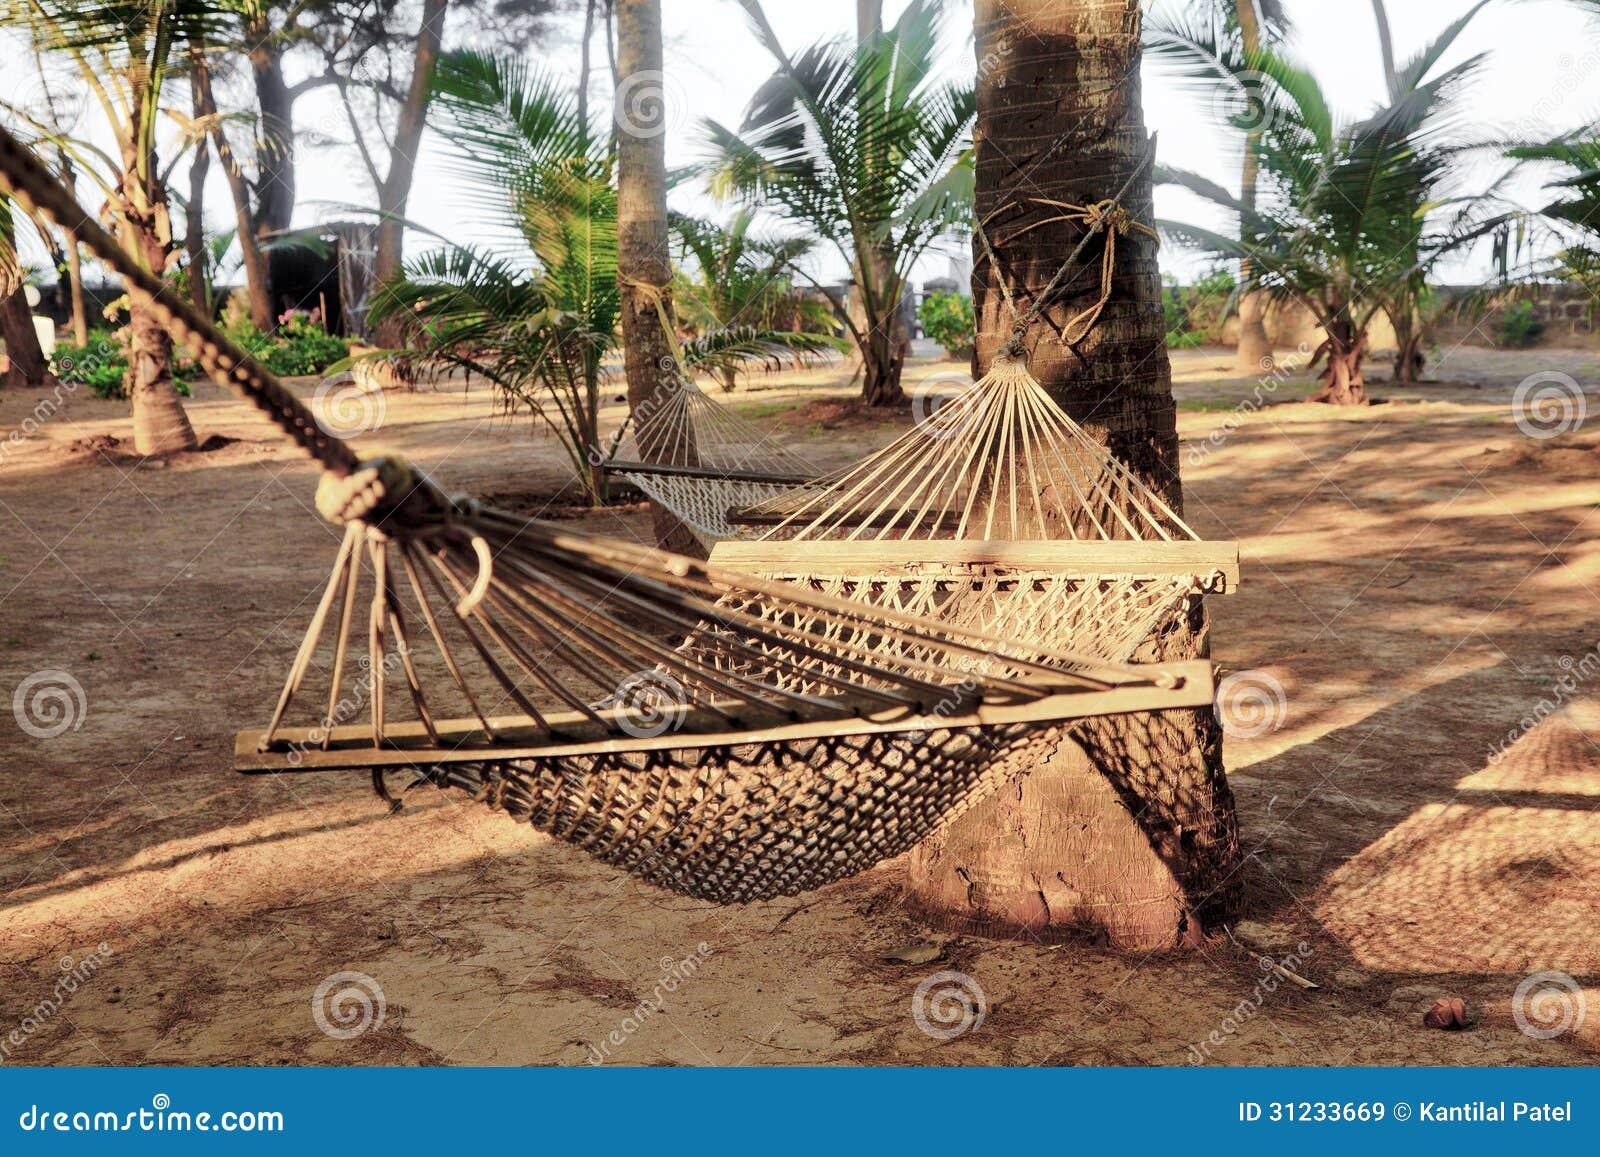 Tropical Garden Hammocks Coconut Tree Stock Photo 31233669 - Megapixl